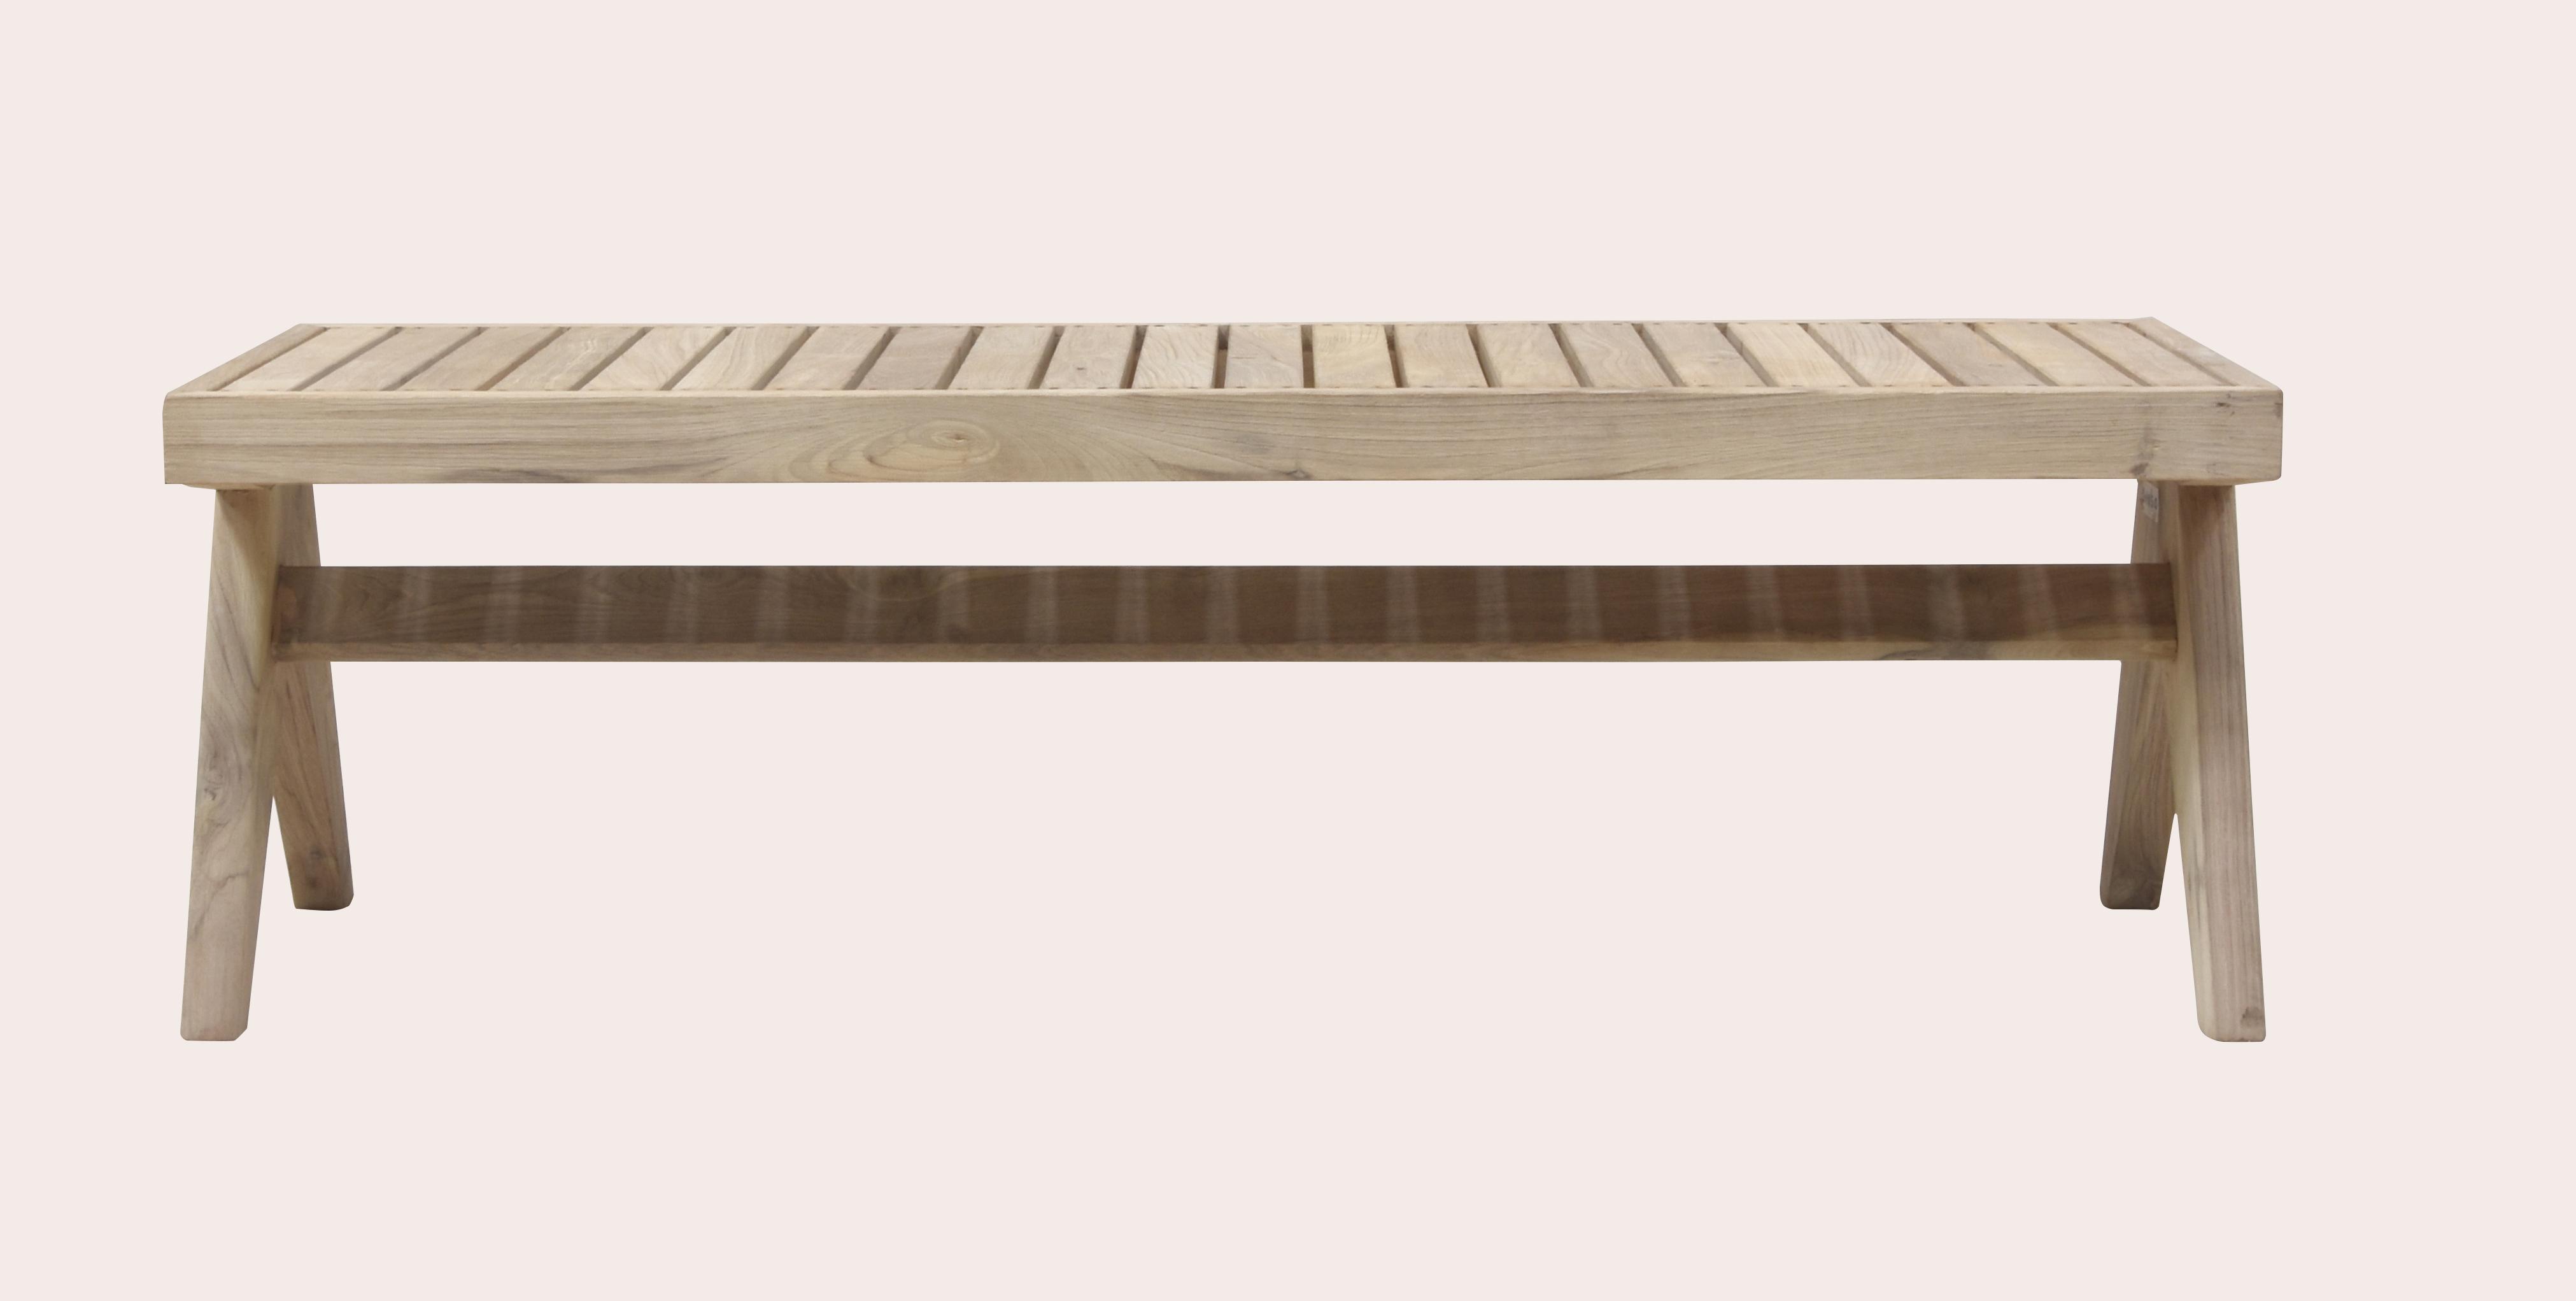 Pierre Jeanneret Outdoor Slatted Bench